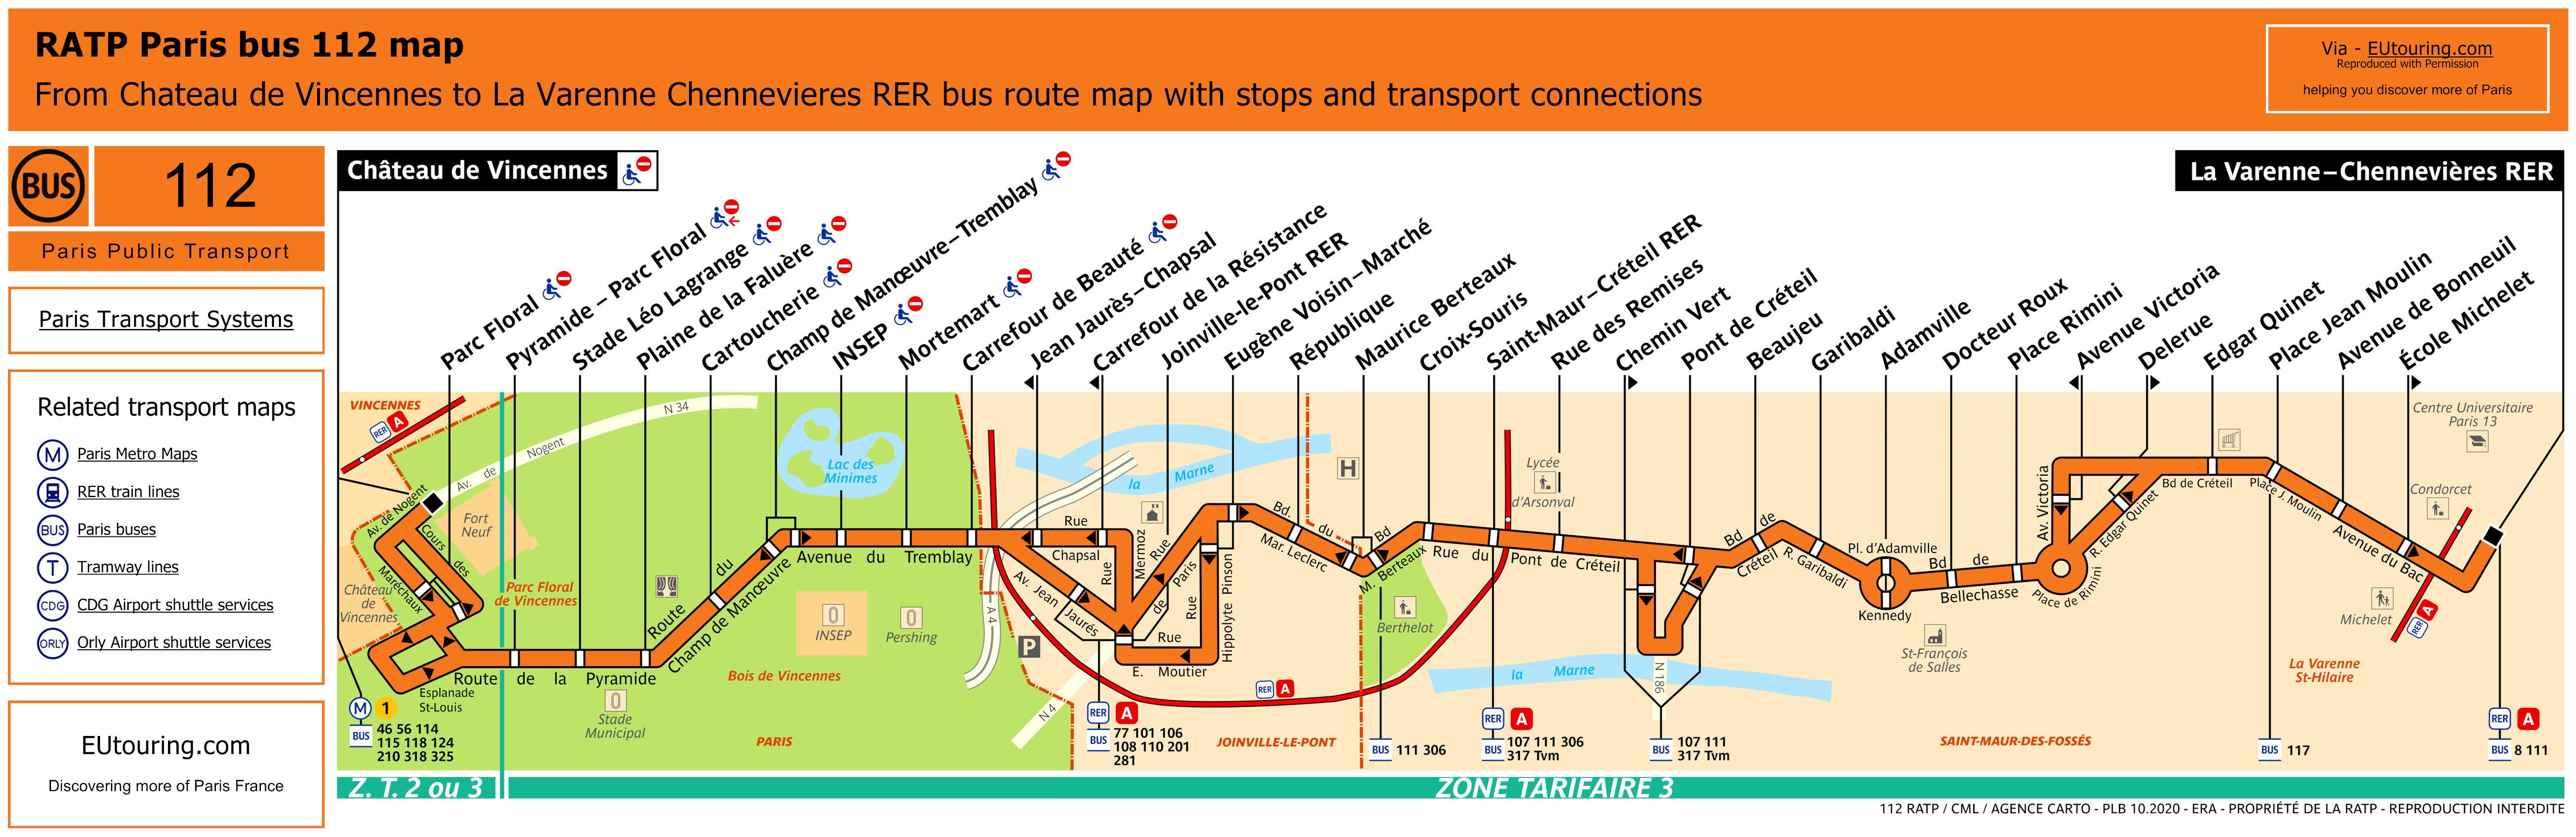 RATP route maps for Paris bus lines 110 through to 119